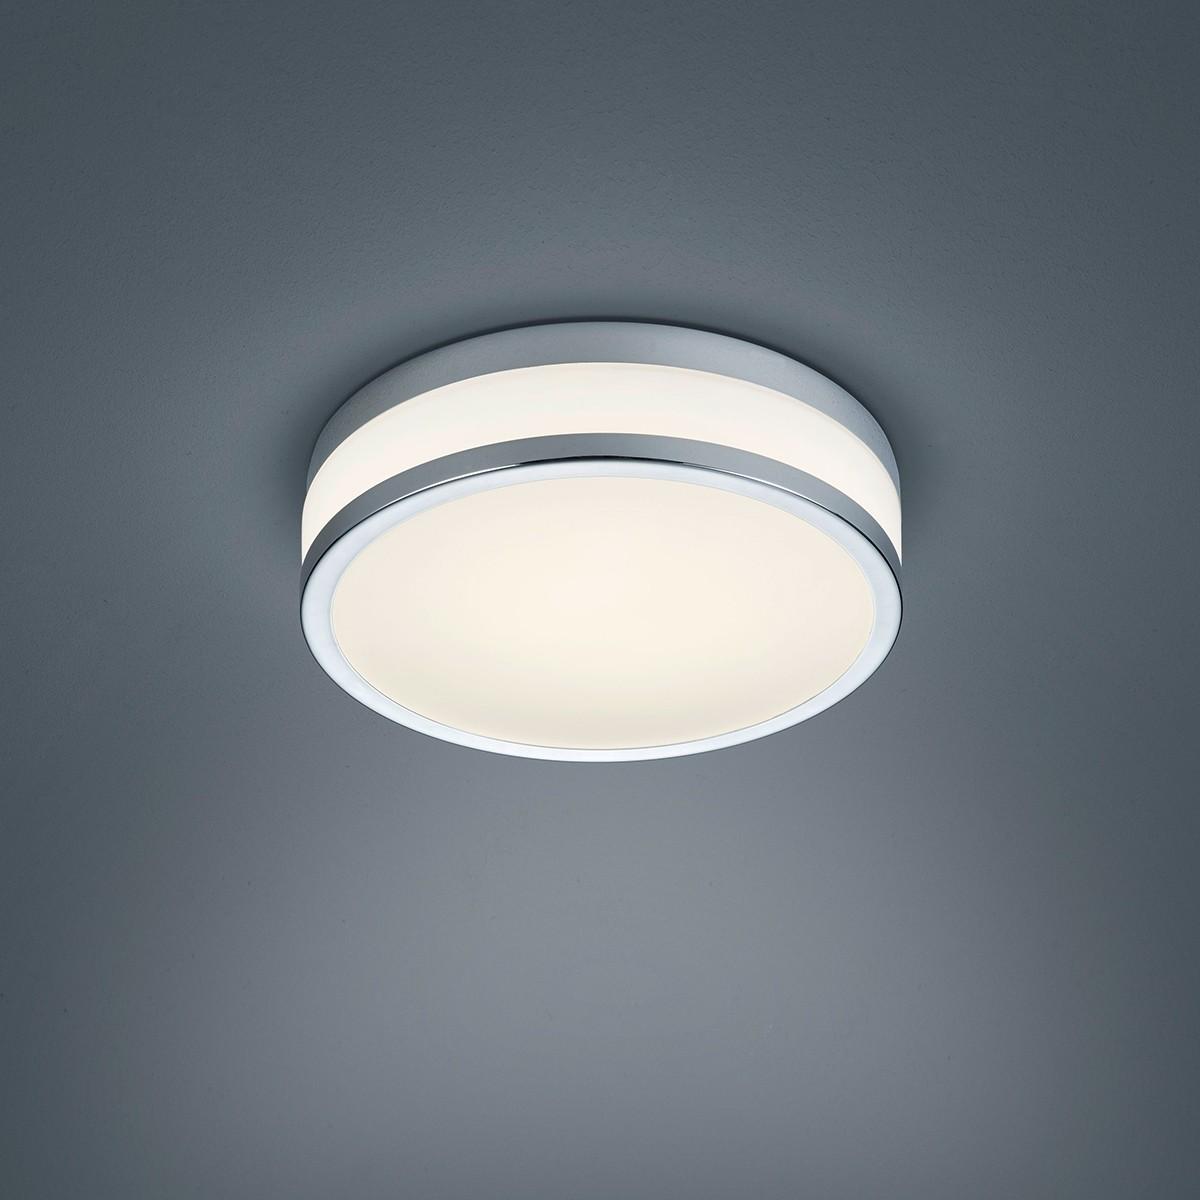 Helestra Zelo LED Deckenleuchte, rund, Ø: 29 cm, Chrom / Opalglas